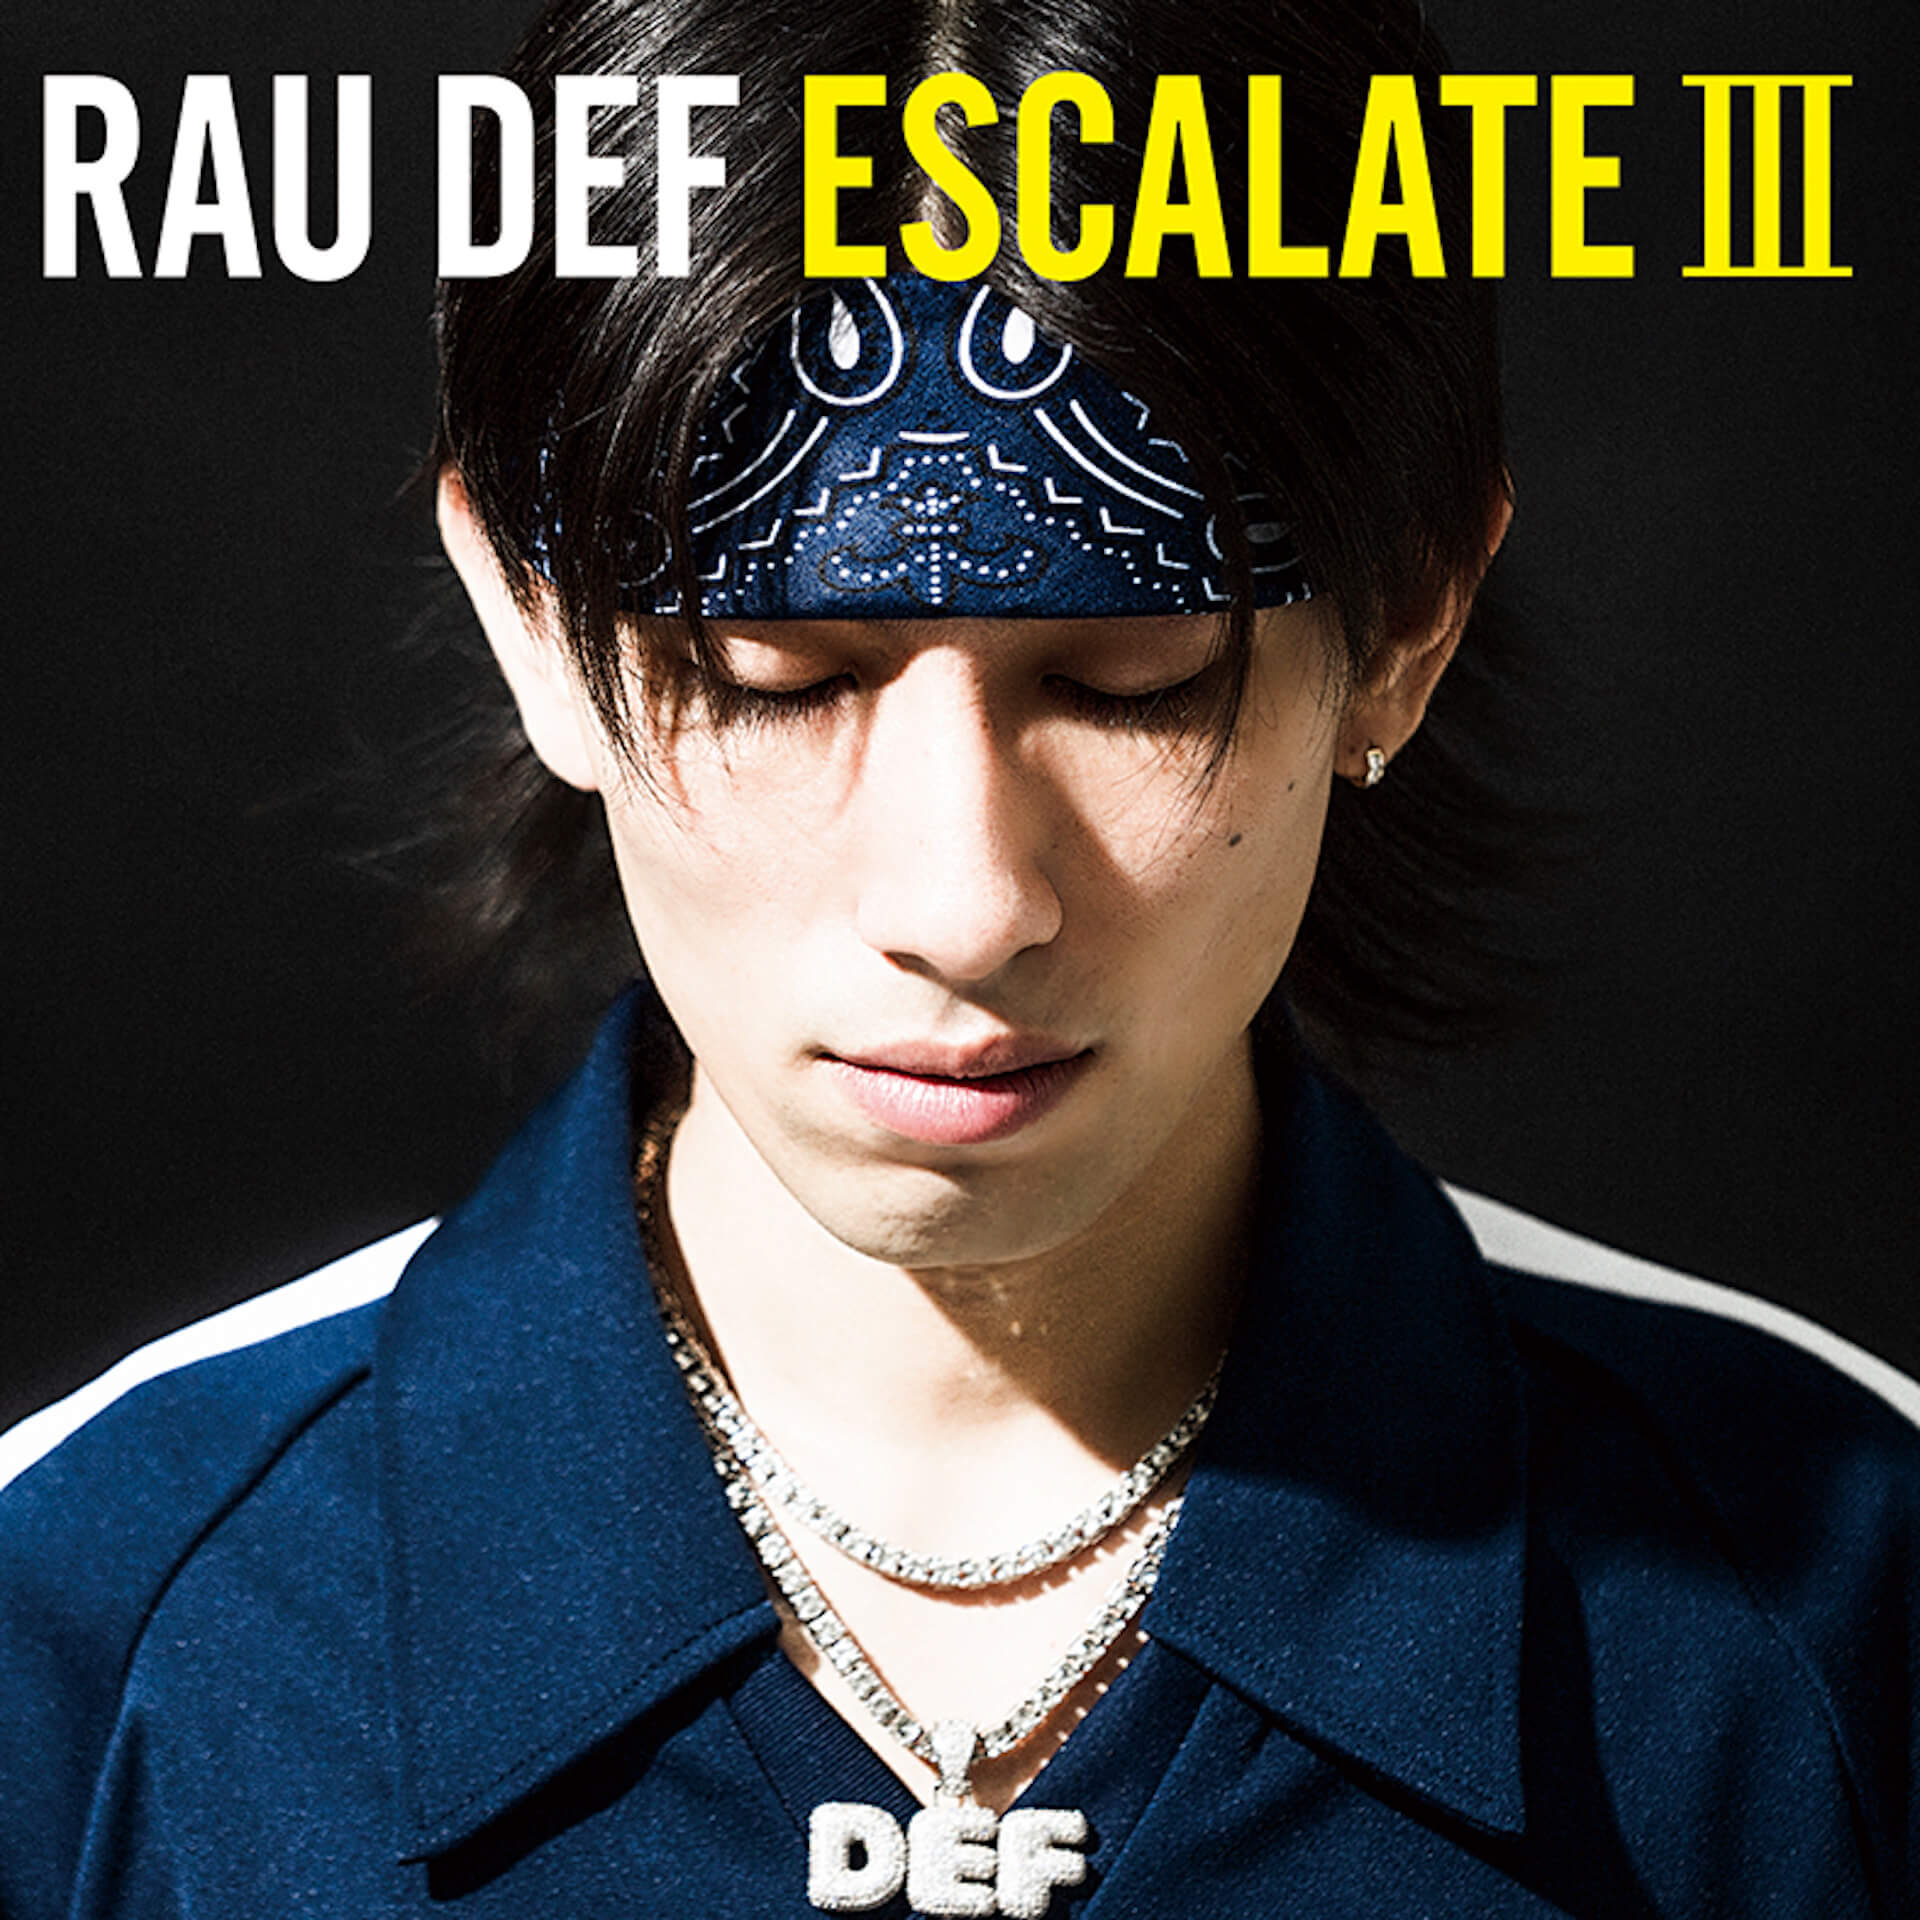 RAU DEF、ニューアルバム『ESCALATE III』を9月25日に発売決定|SKY-HI、PUNPEE、JNKMN、kamuiらが客演 music190821-raudef-2